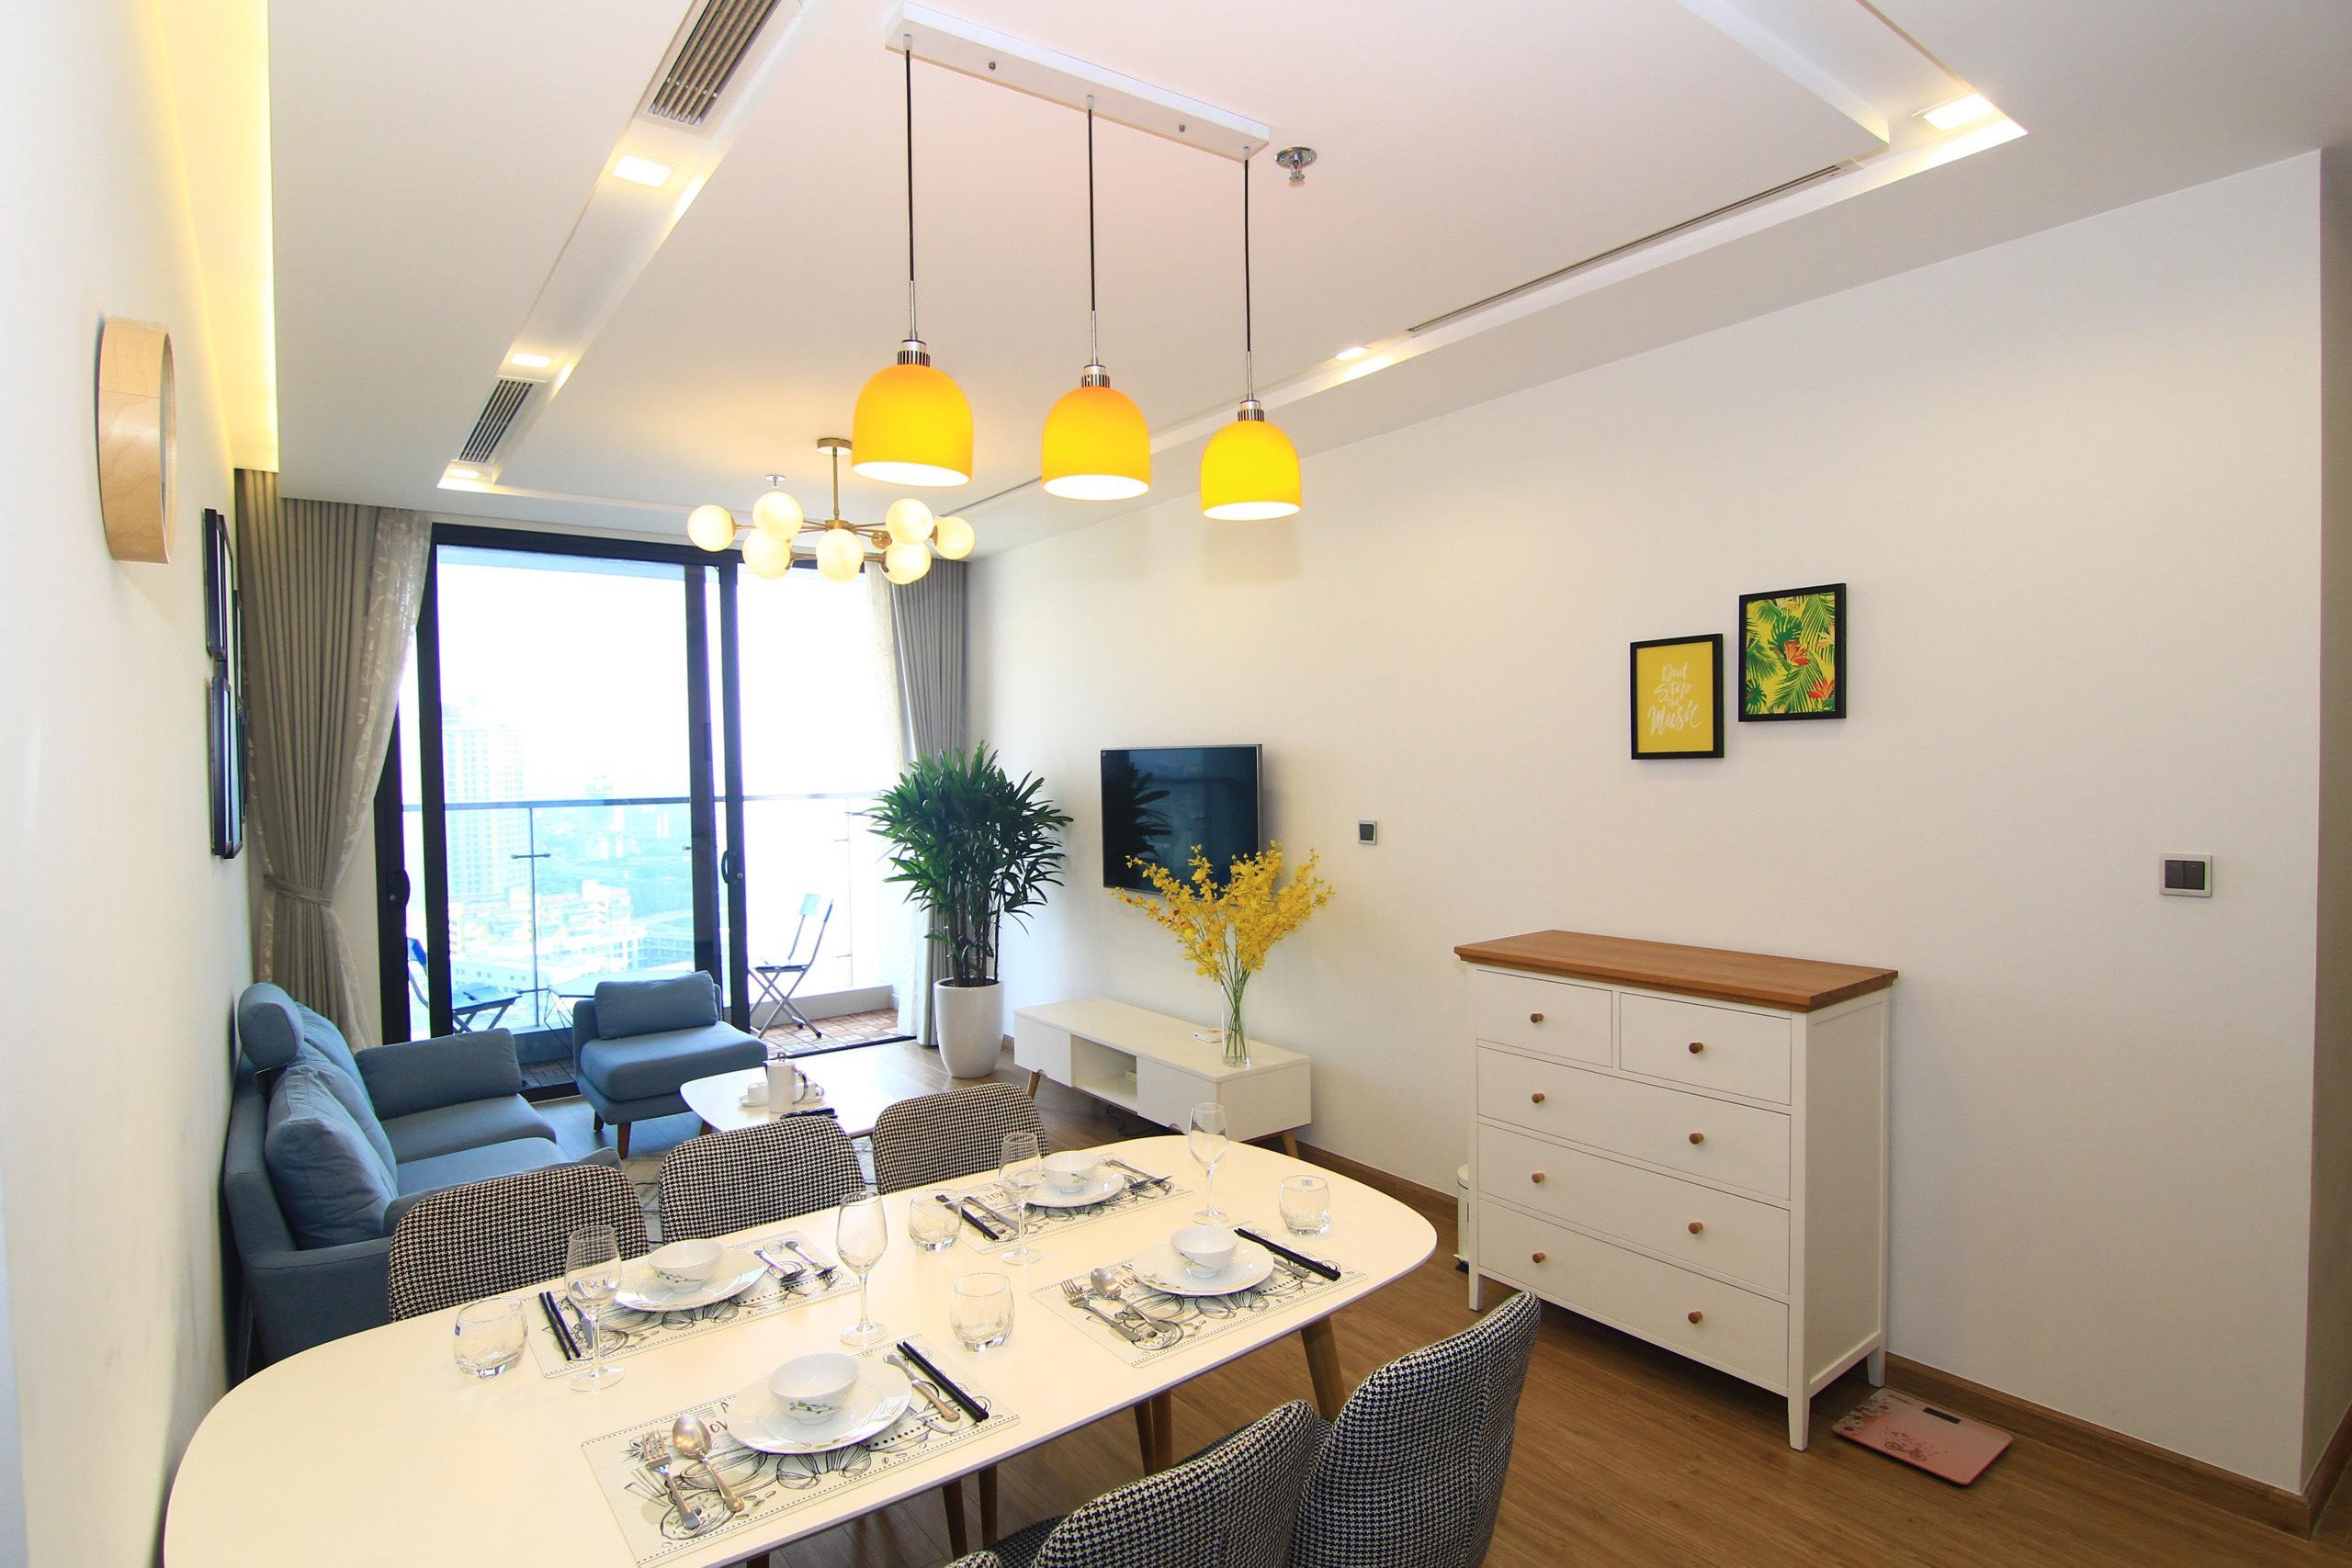 Apartment for Rent in Vinhomes Metropolis Lieu Giai